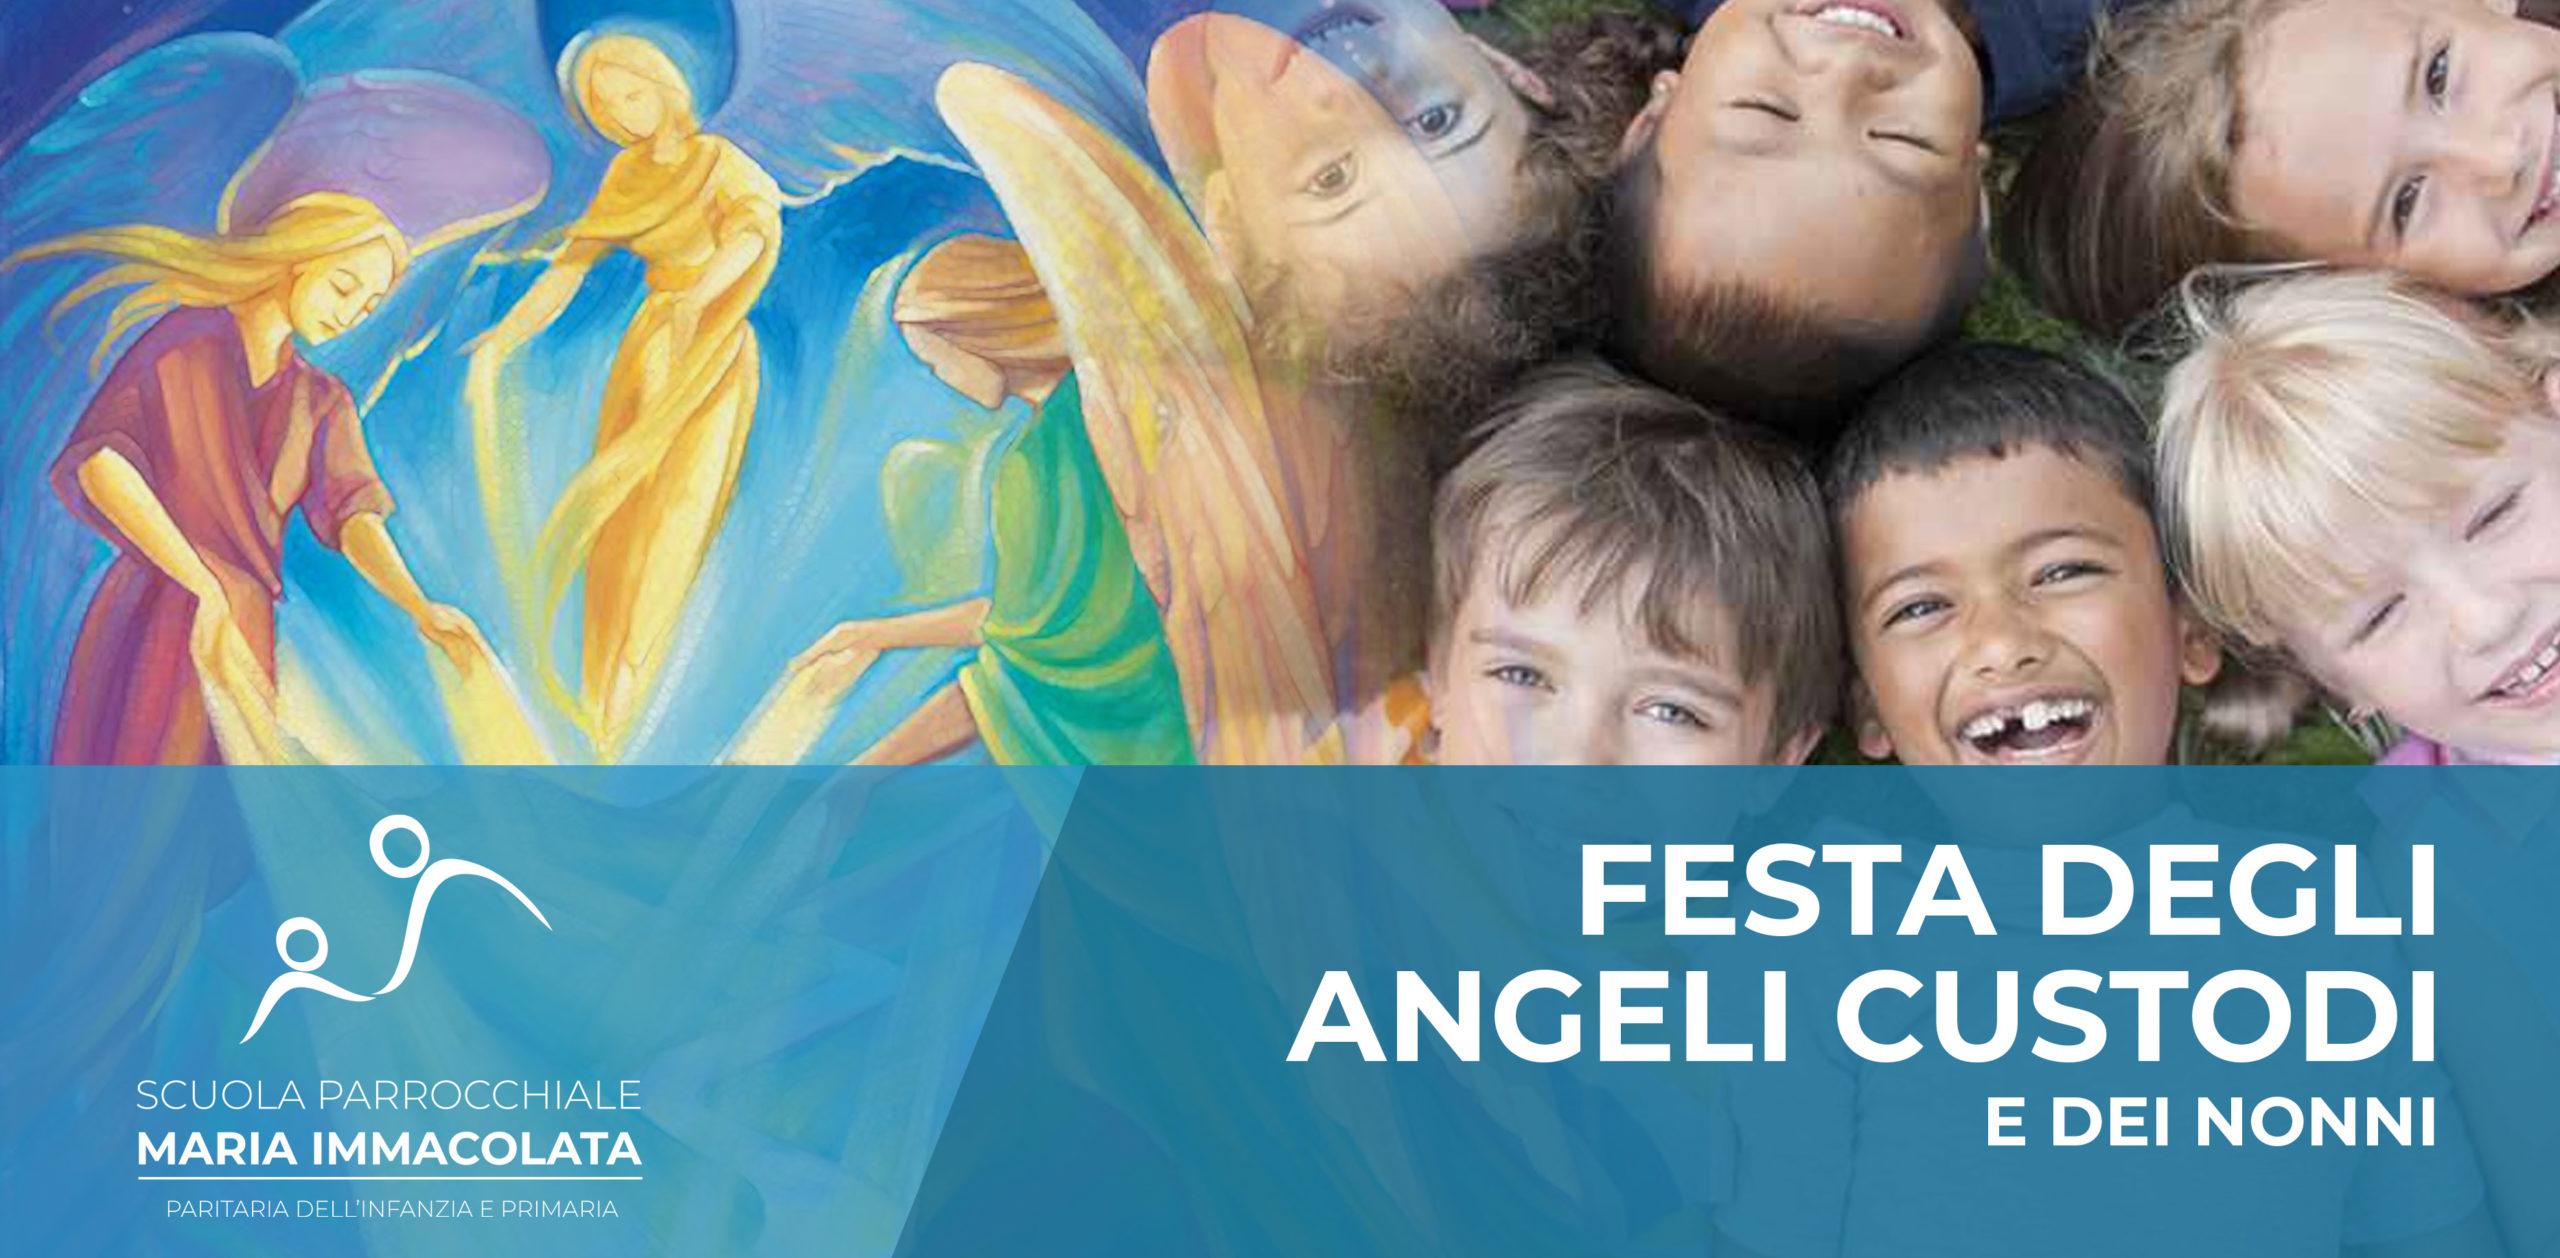 Venerdì 1 ottobre 2021: Festa degli Angeli Custodi e dei nonni